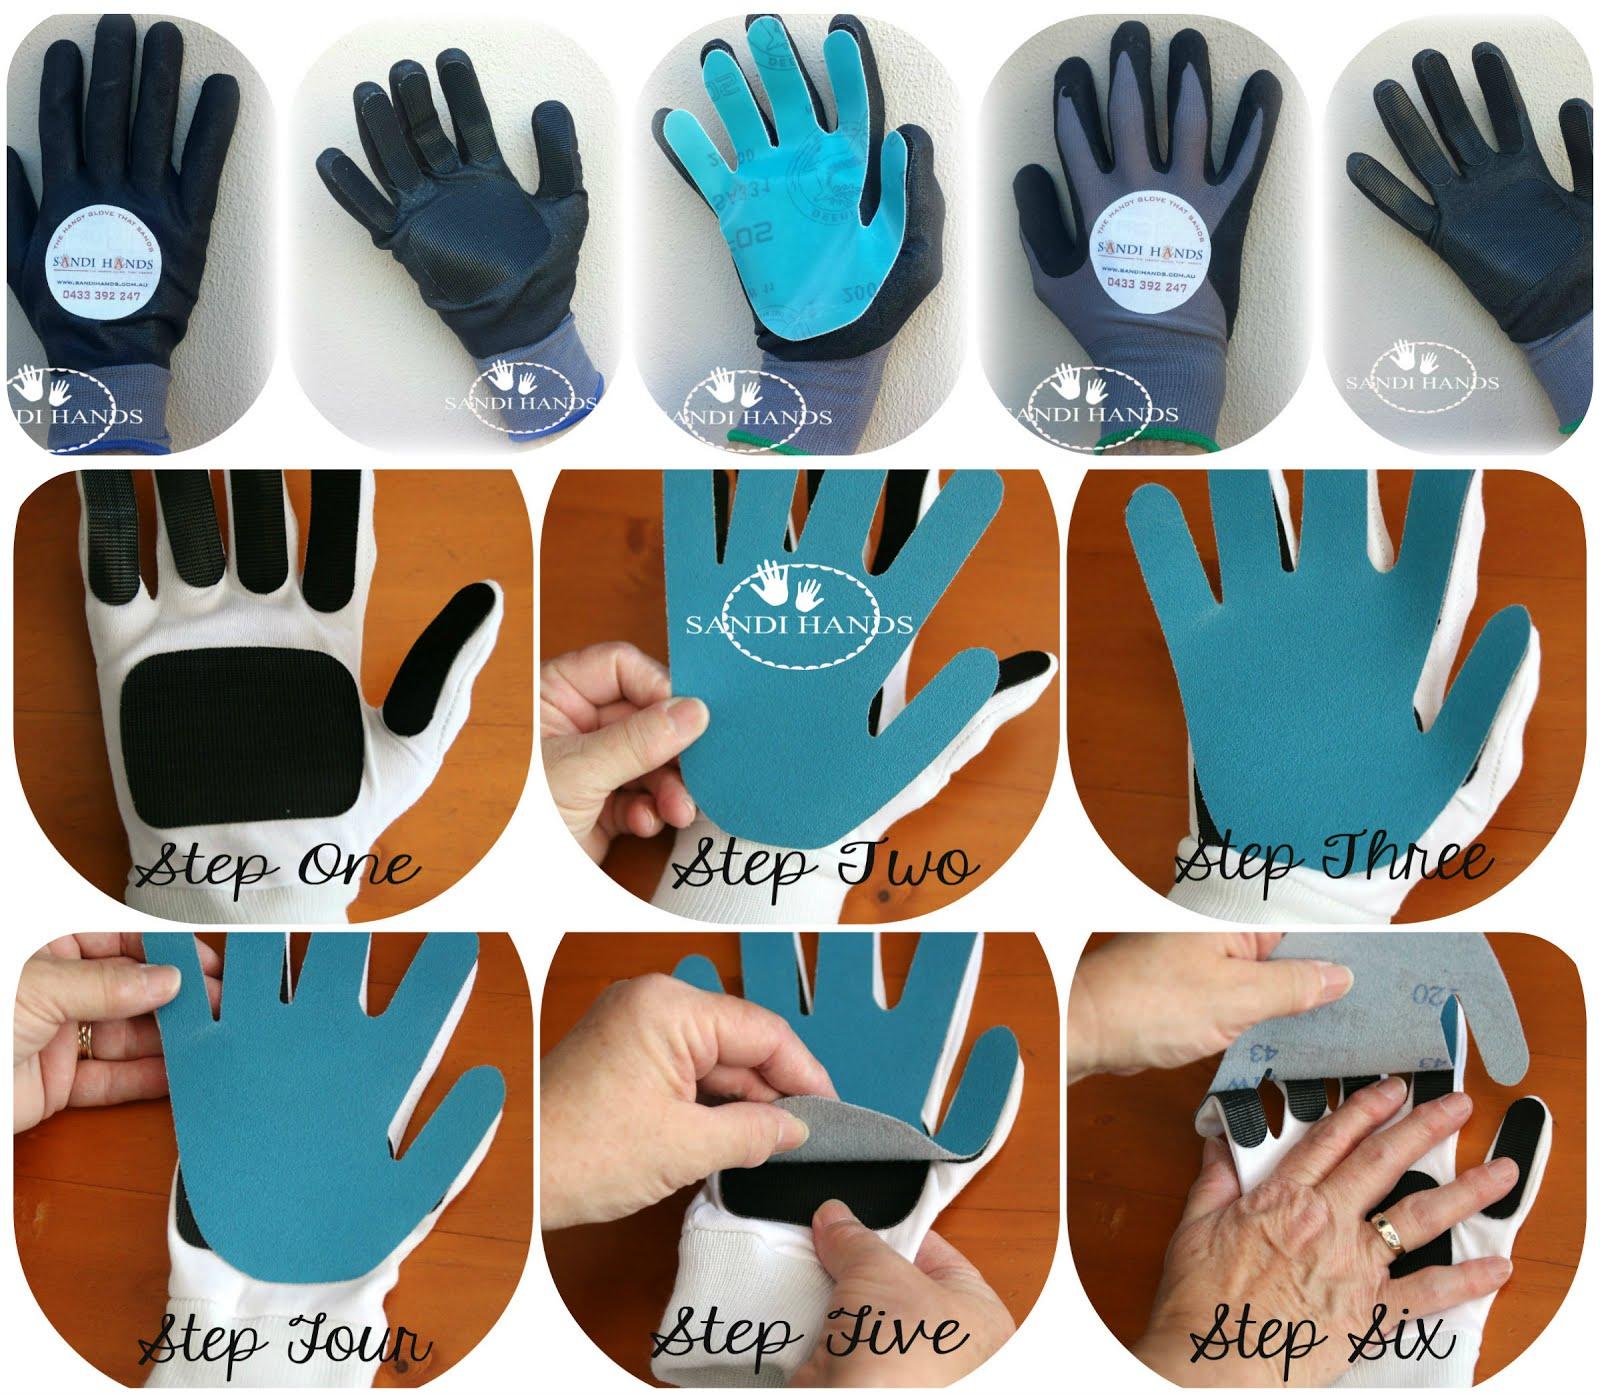 SANDI HANDS